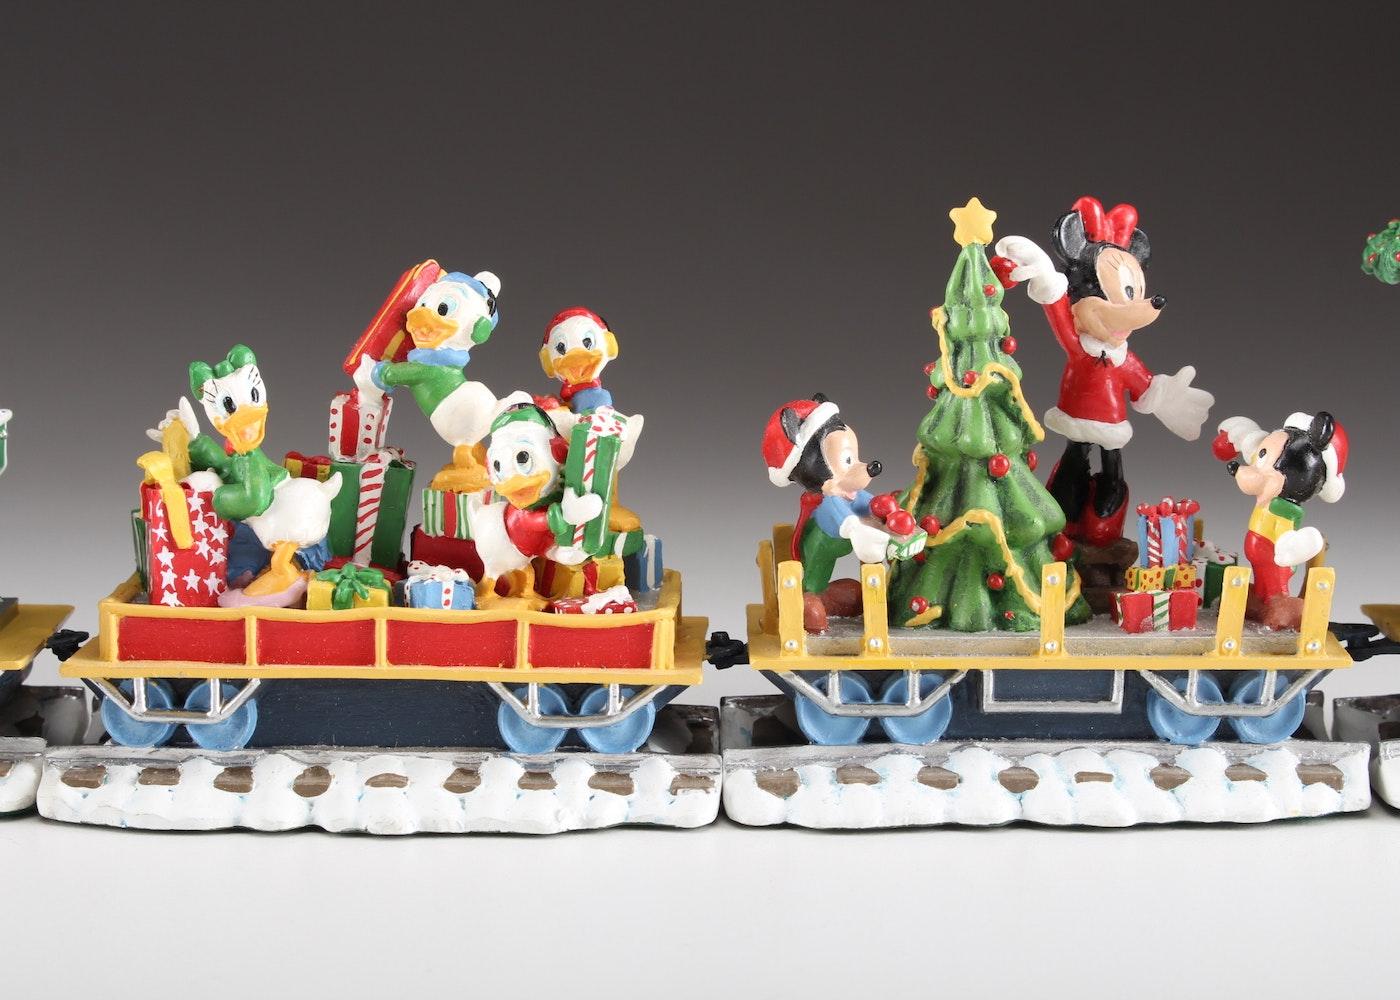 Disney Danbury Mint Mickeys Christmas Train Set Ebth